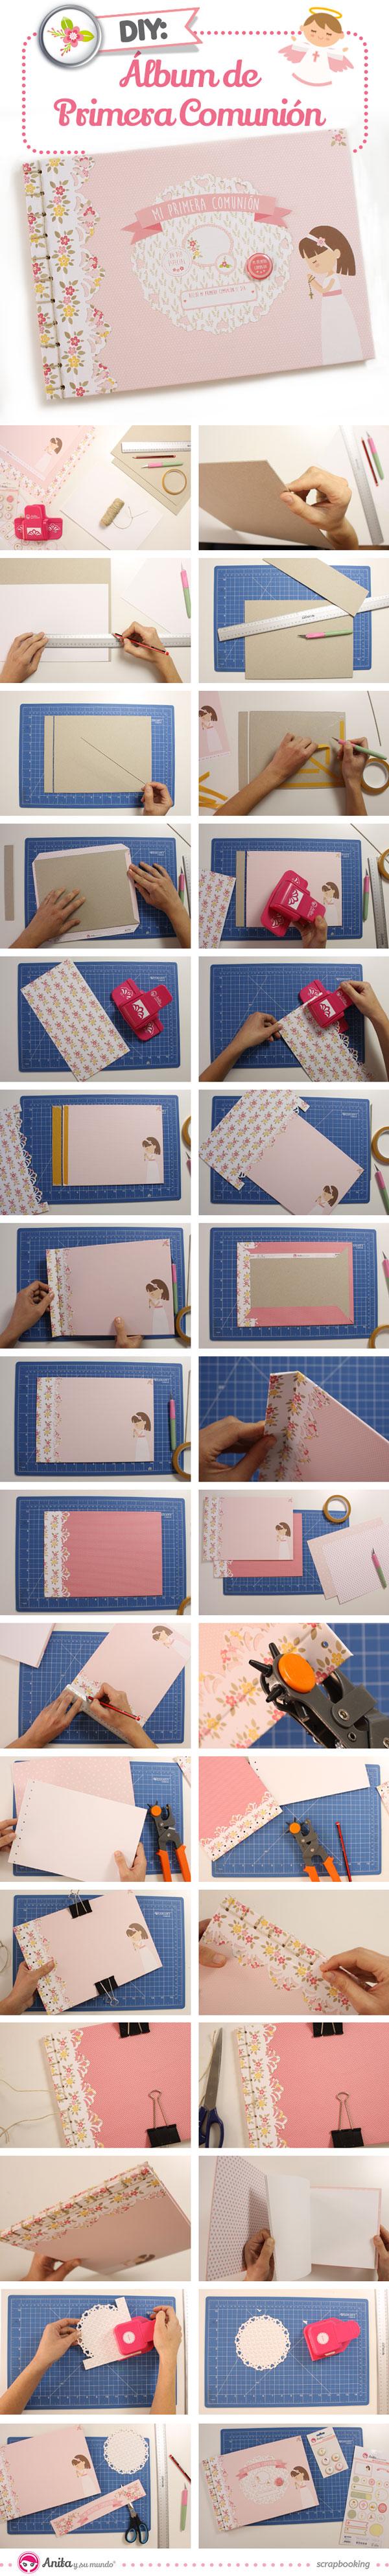 tutorial paso a paso álbum primera comunión niña con encuadernación japonesa